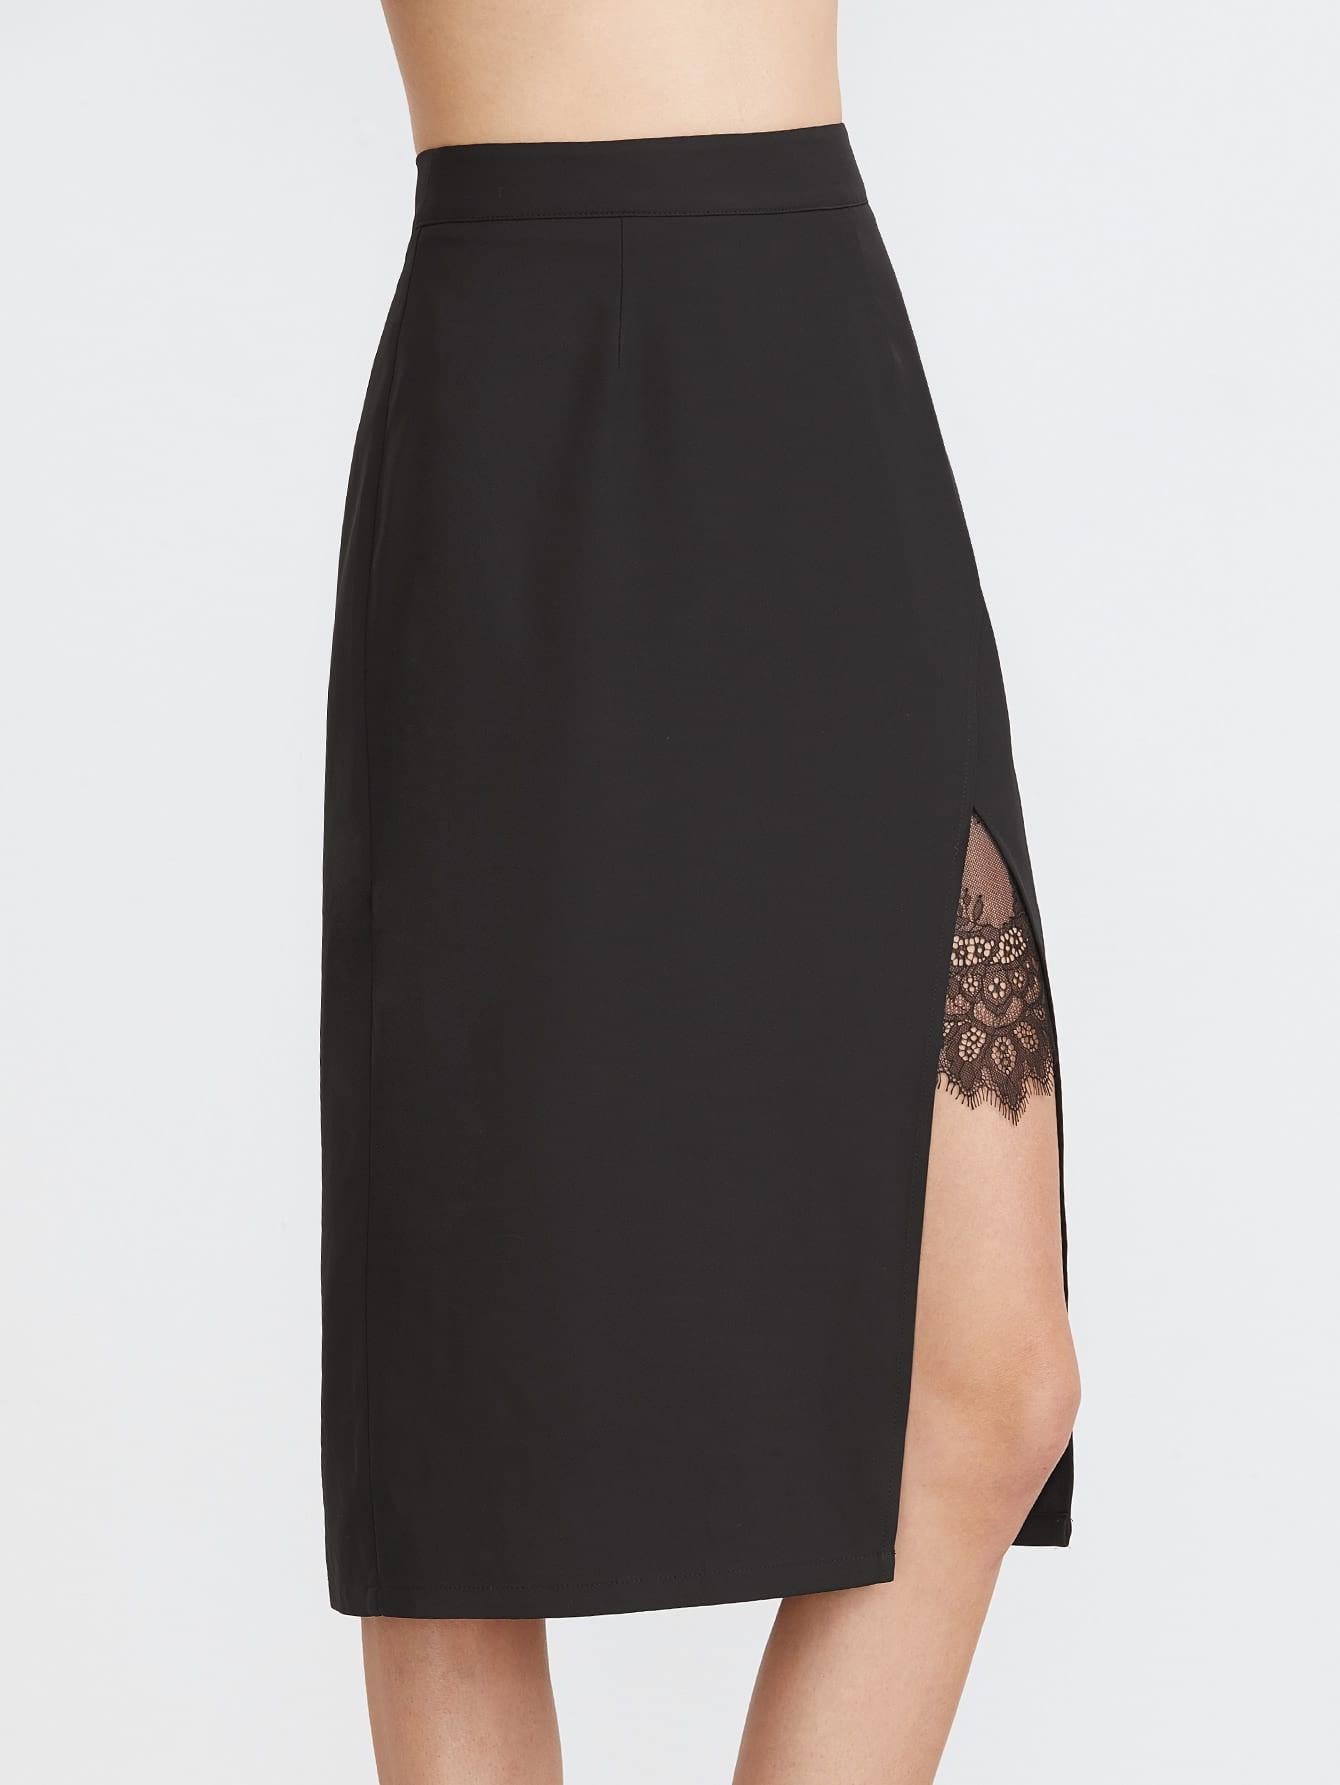 jupe de taille moyenne en dentelle inserte d chir devant noir french shein sheinside. Black Bedroom Furniture Sets. Home Design Ideas